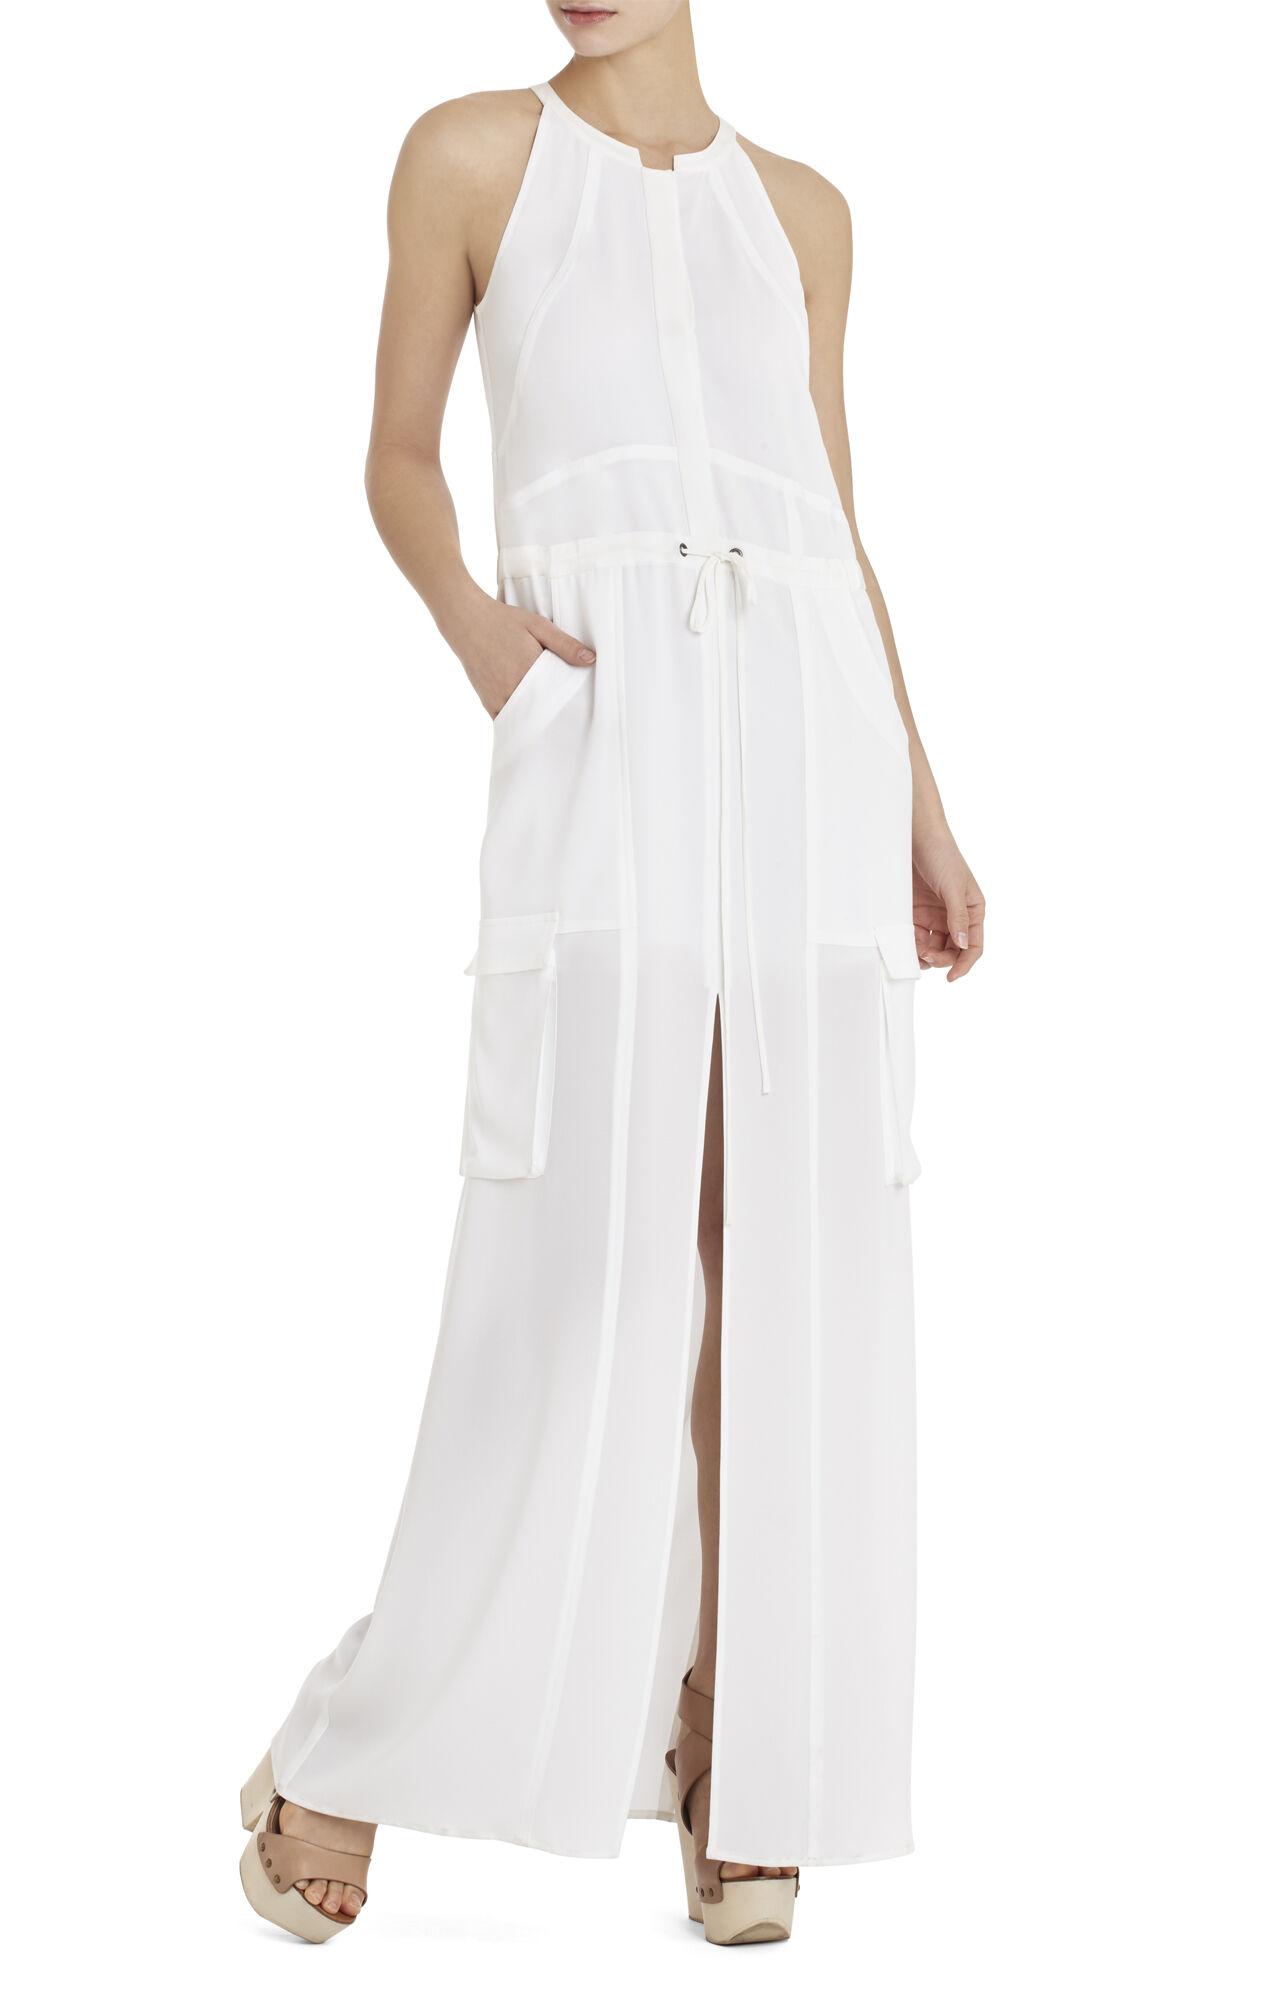 Runway Julianne Drop-Waist Dress